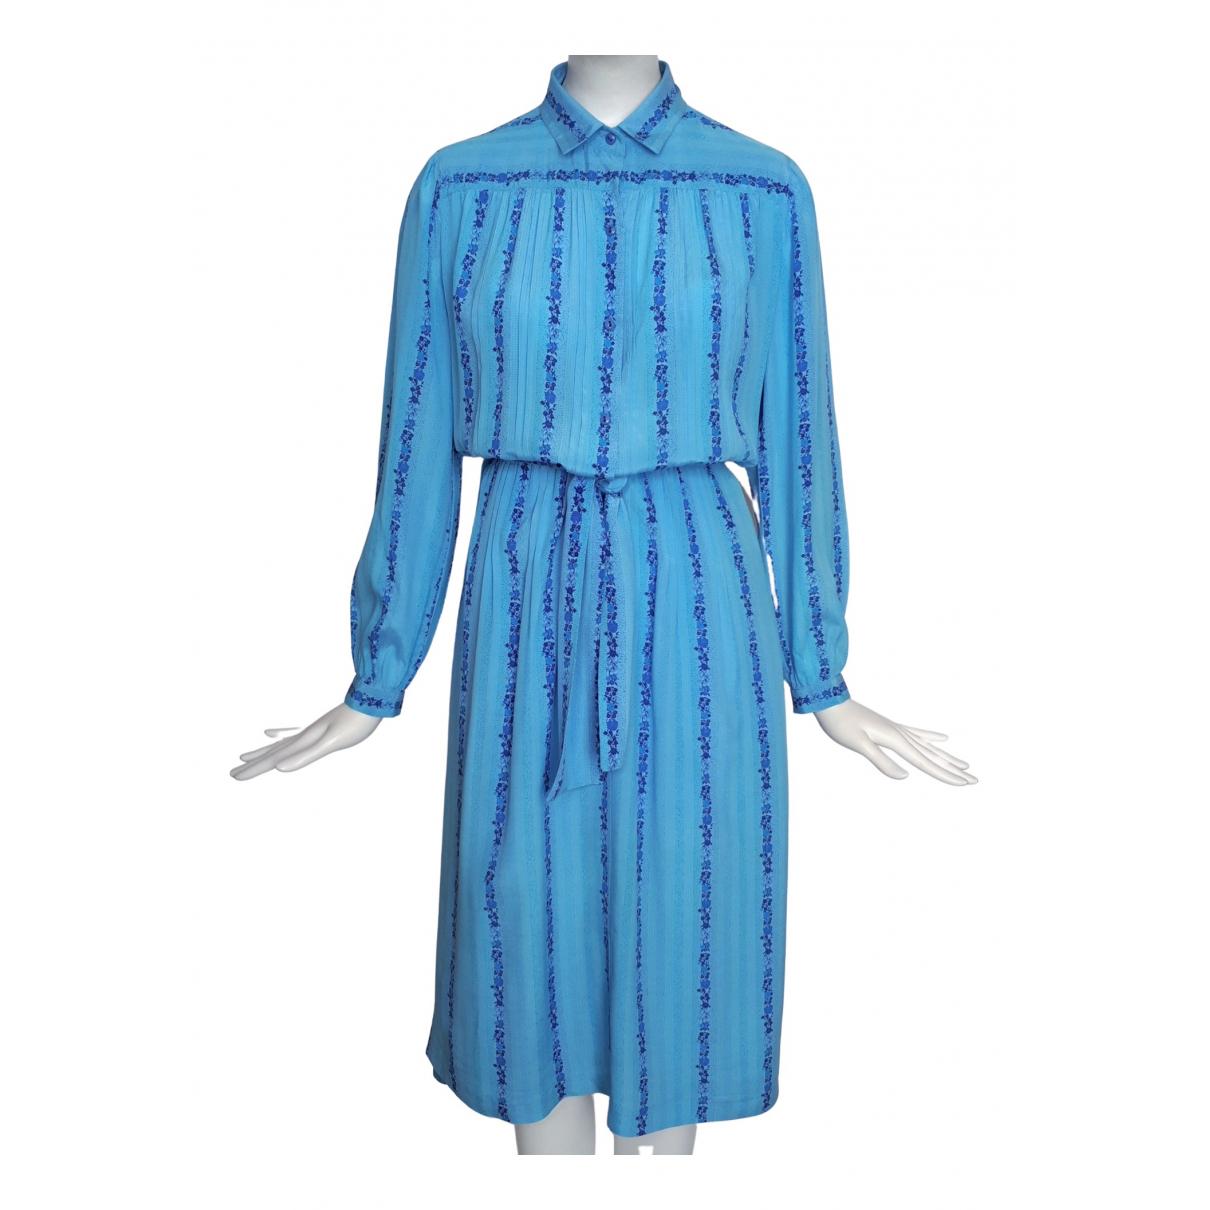 Louis Feraud \N Blue dress for Women 44 FR